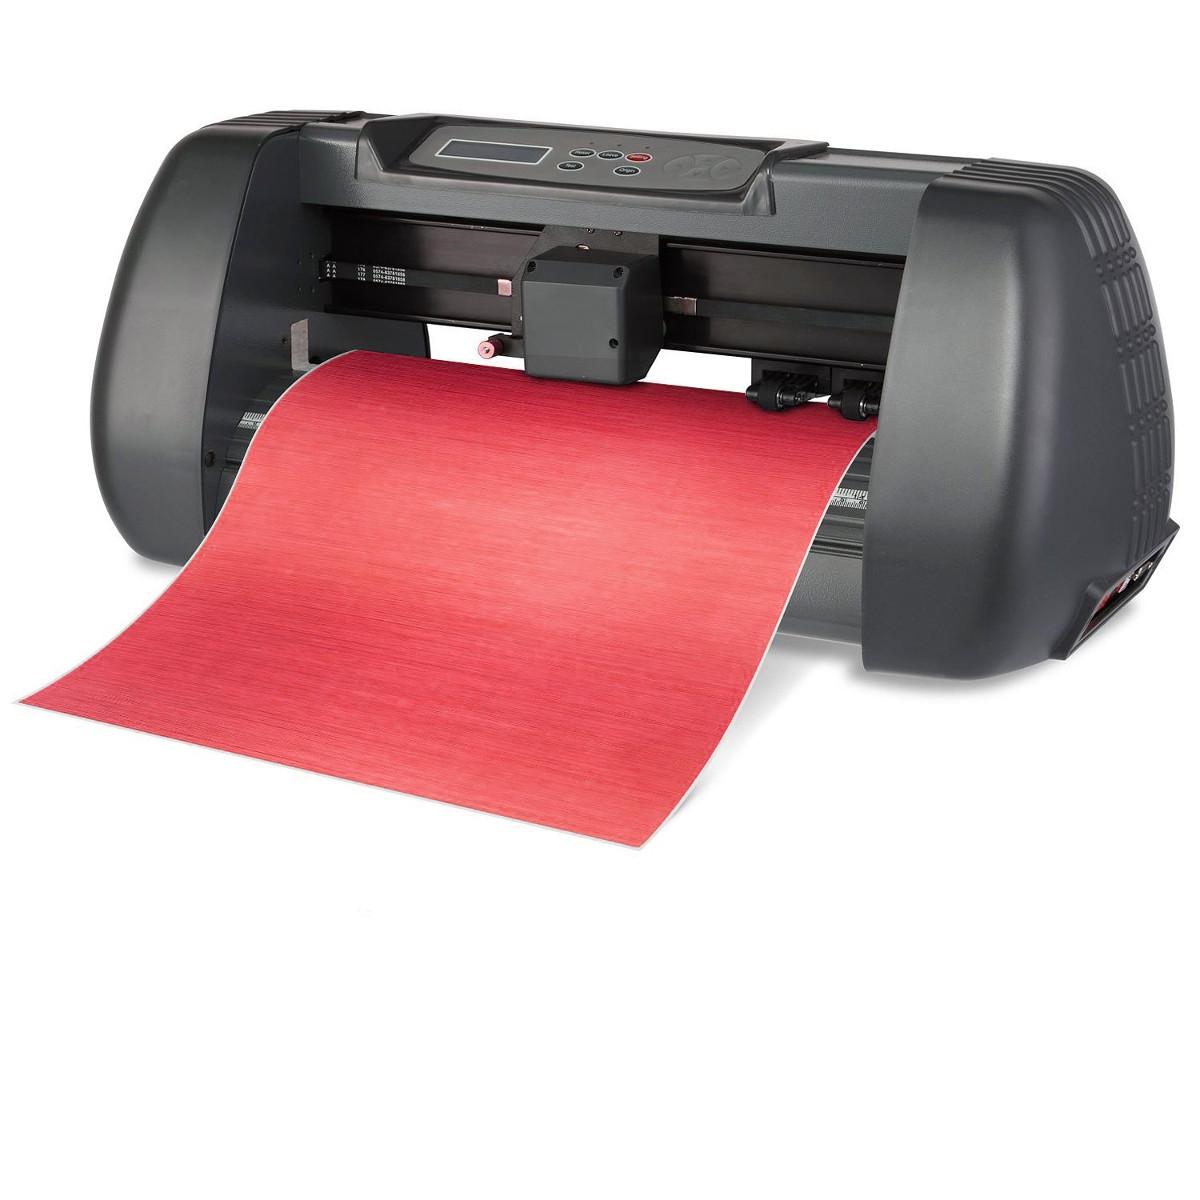 50Pcs Transfer Foil Paper Hot Laminator Red for Laser Printer